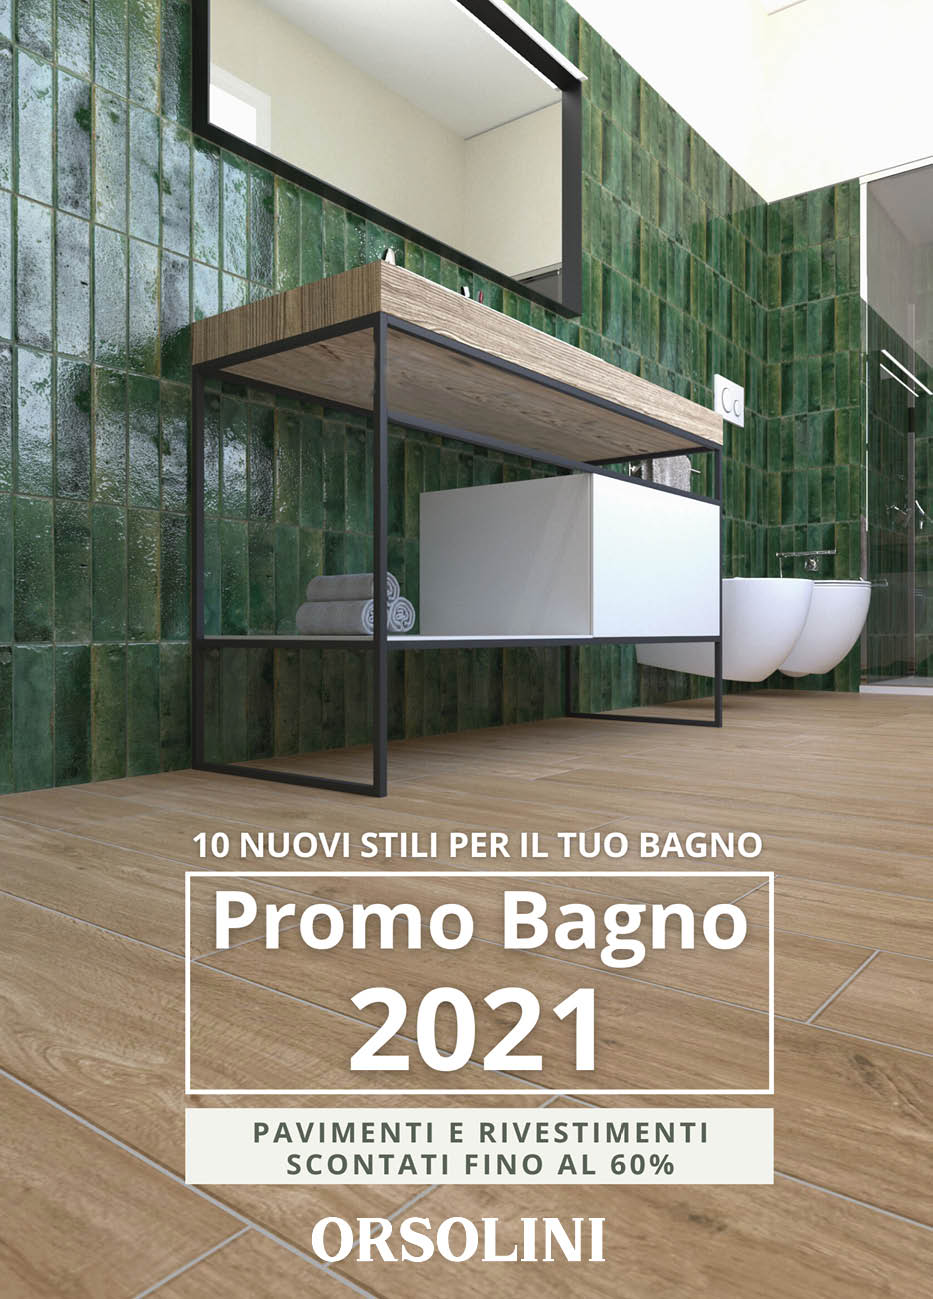 promo-bagno-01-2021-total-look-01